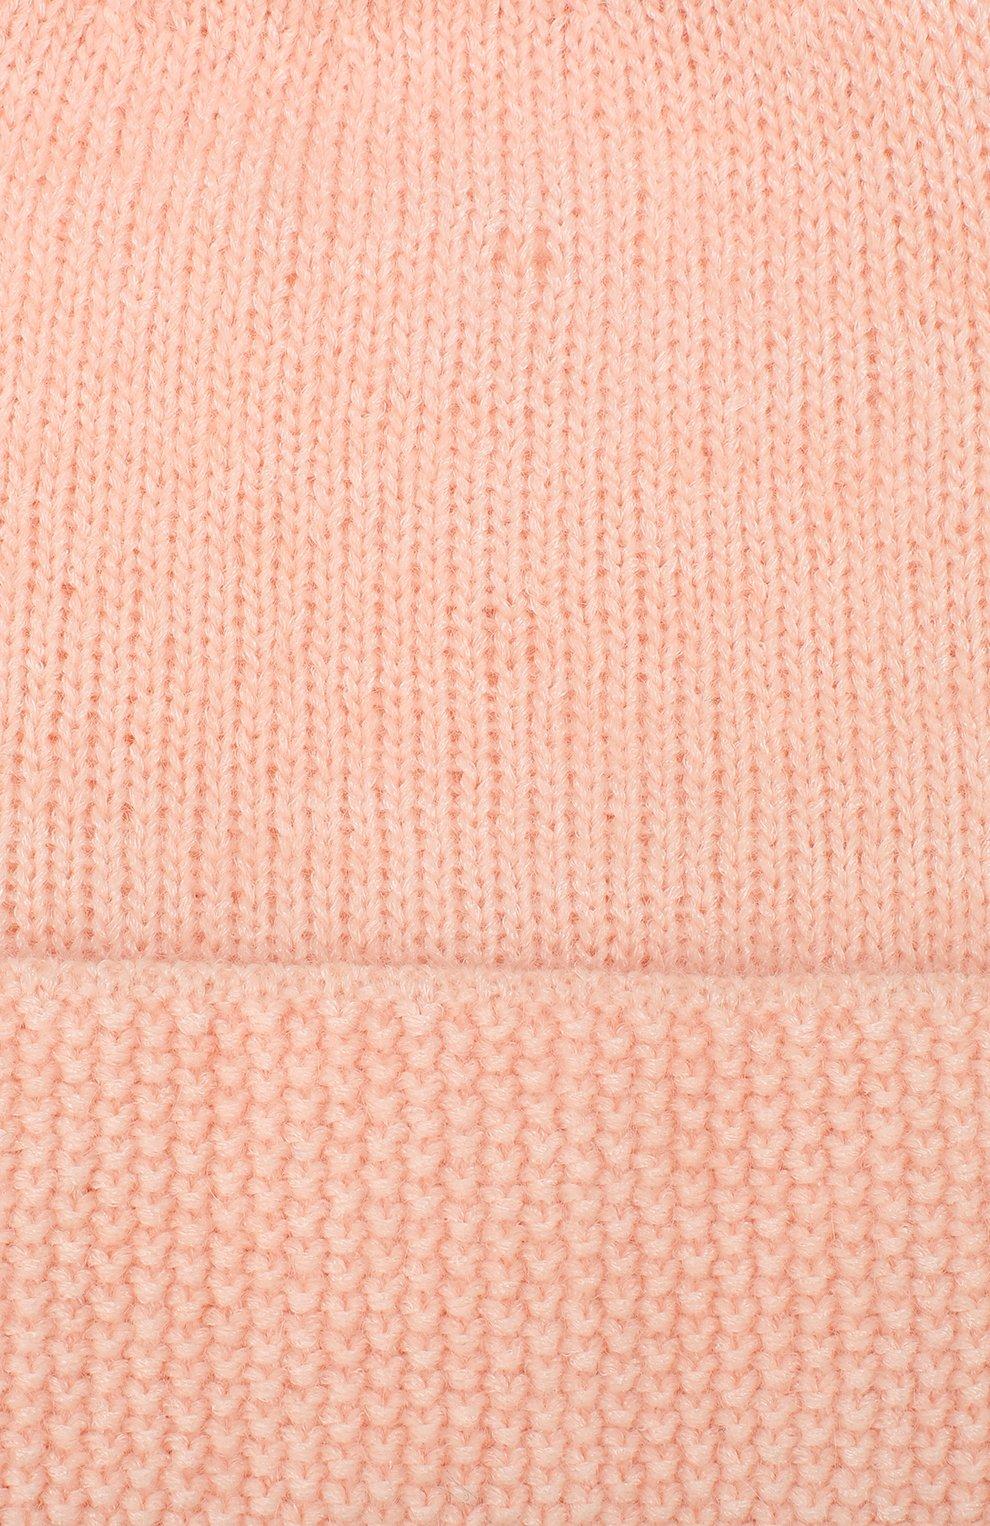 Женская шапка odette CANOE светло-розового цвета, арт. 4918466   Фото 3